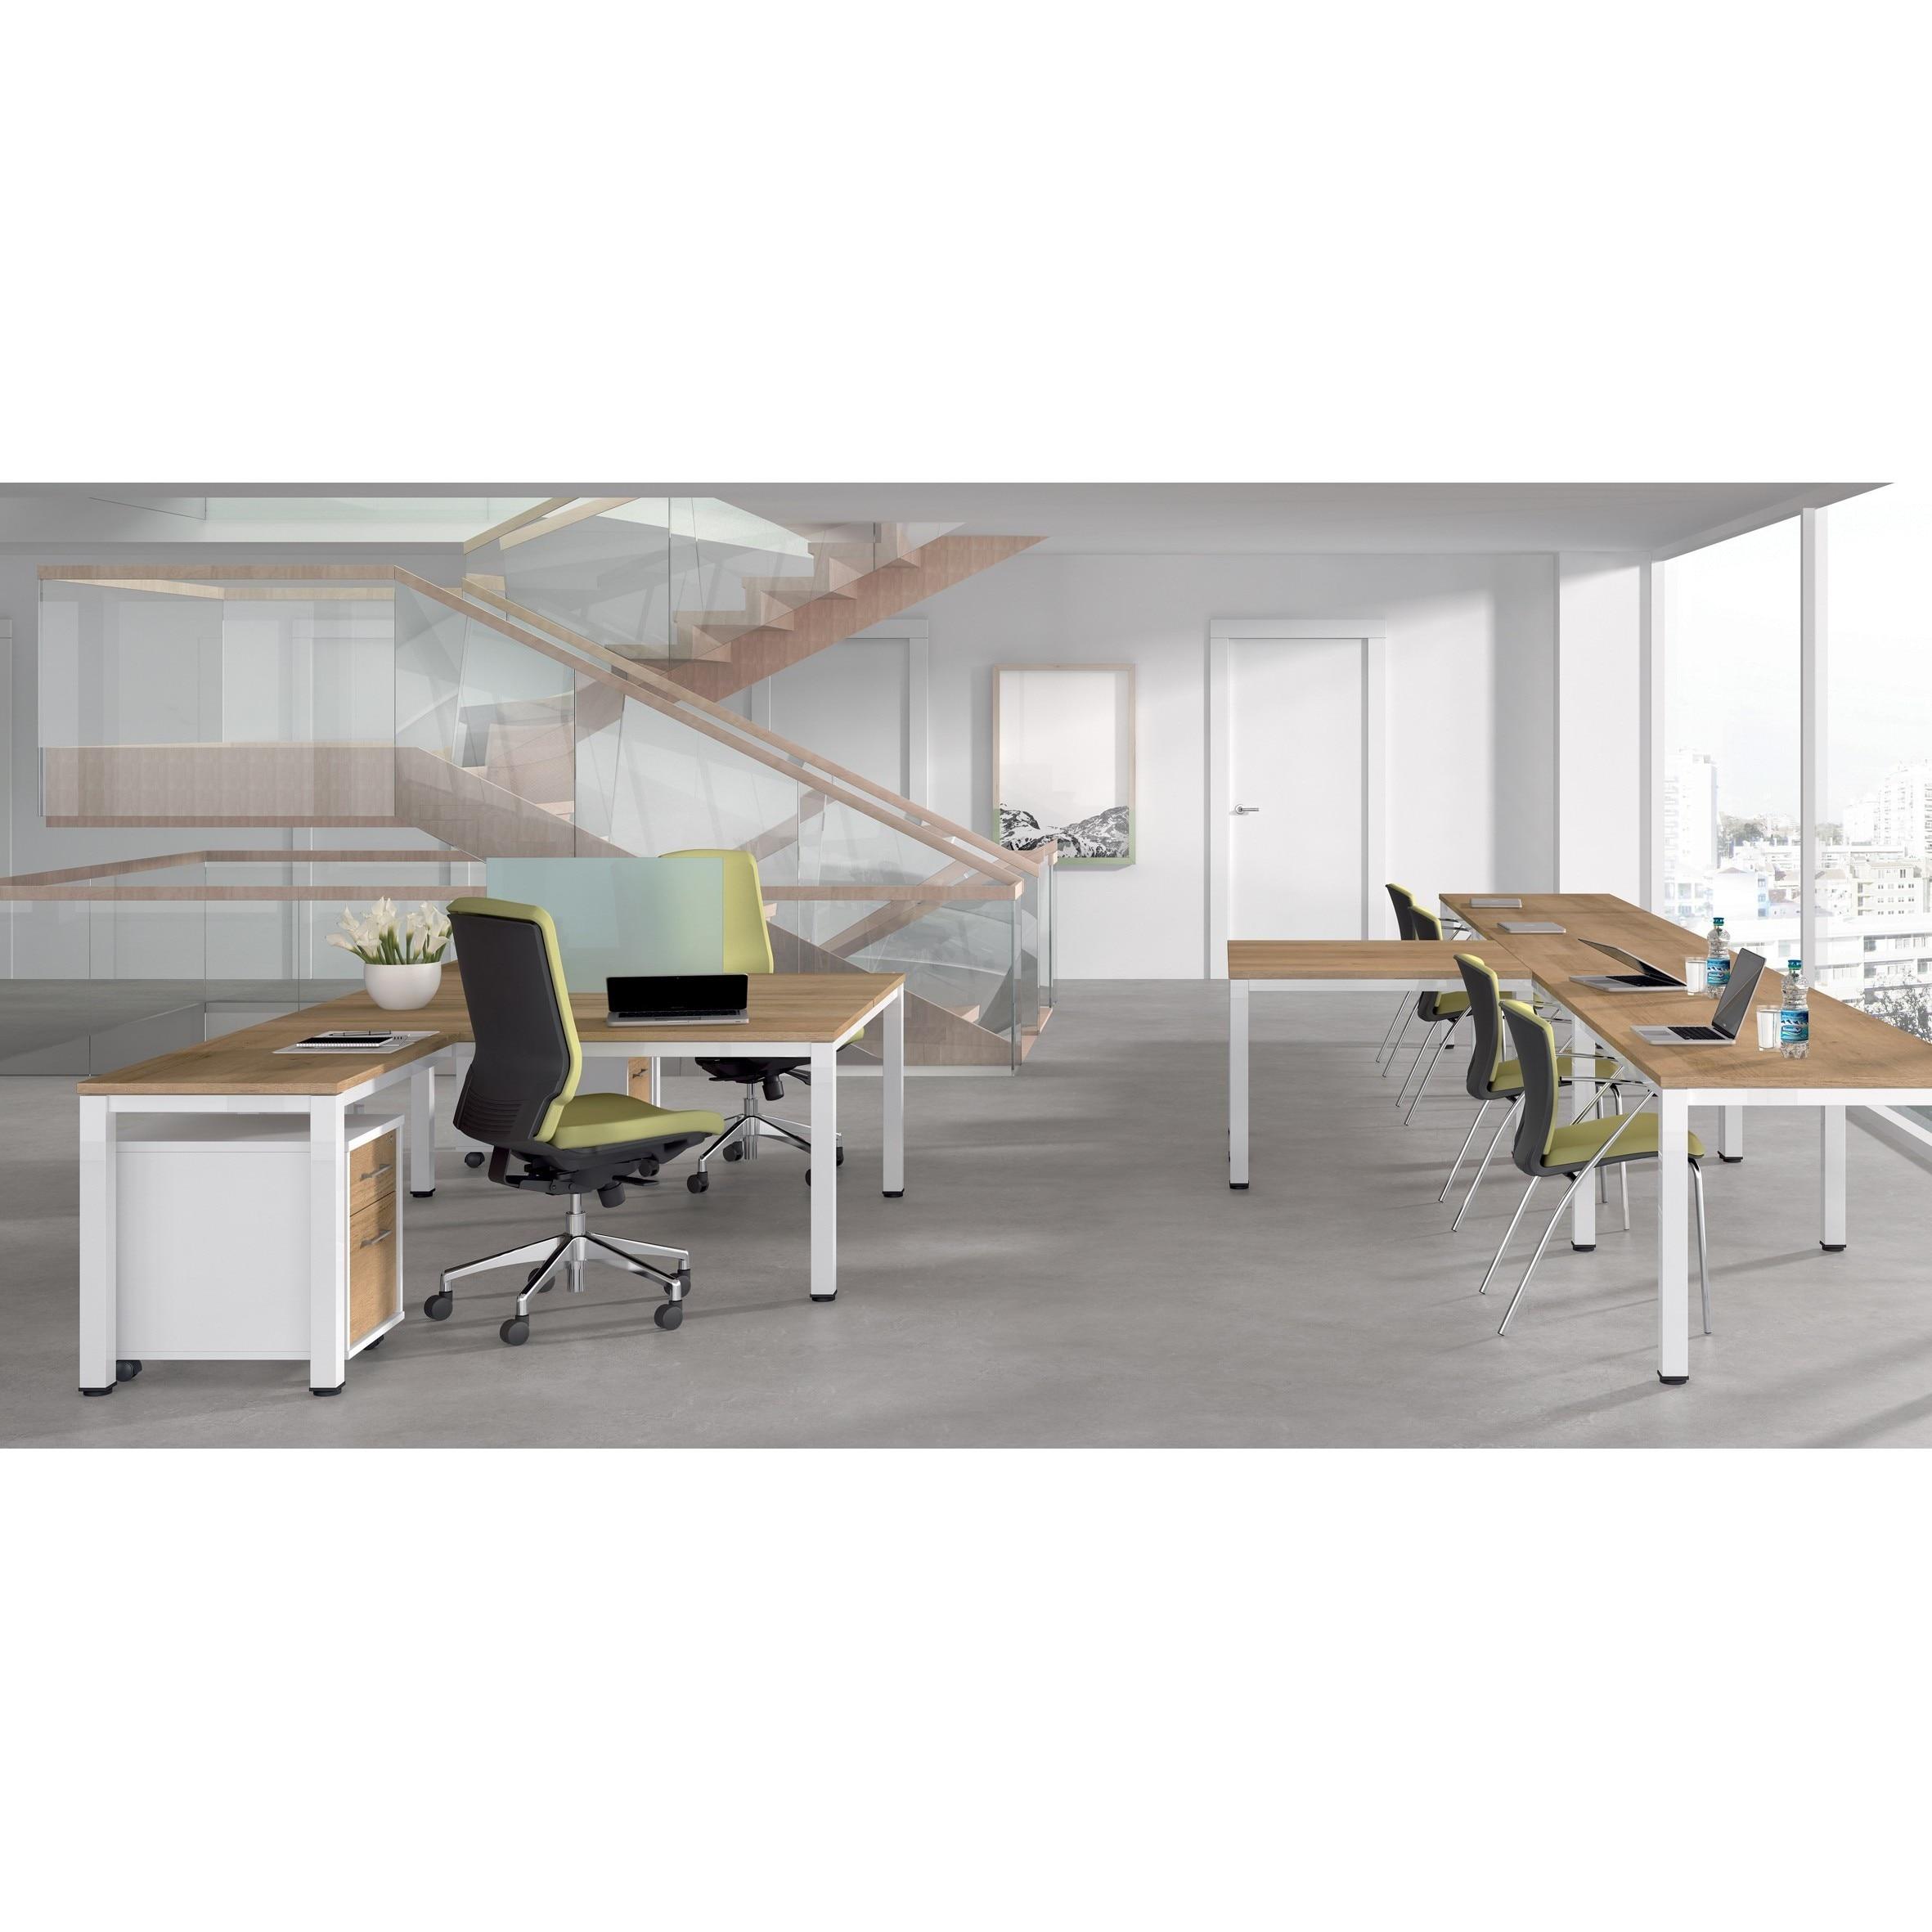 TABLE DE OFFICE DOUBLE EXECUTIVE SERIES 160X163 ALUMINUM/WHITE